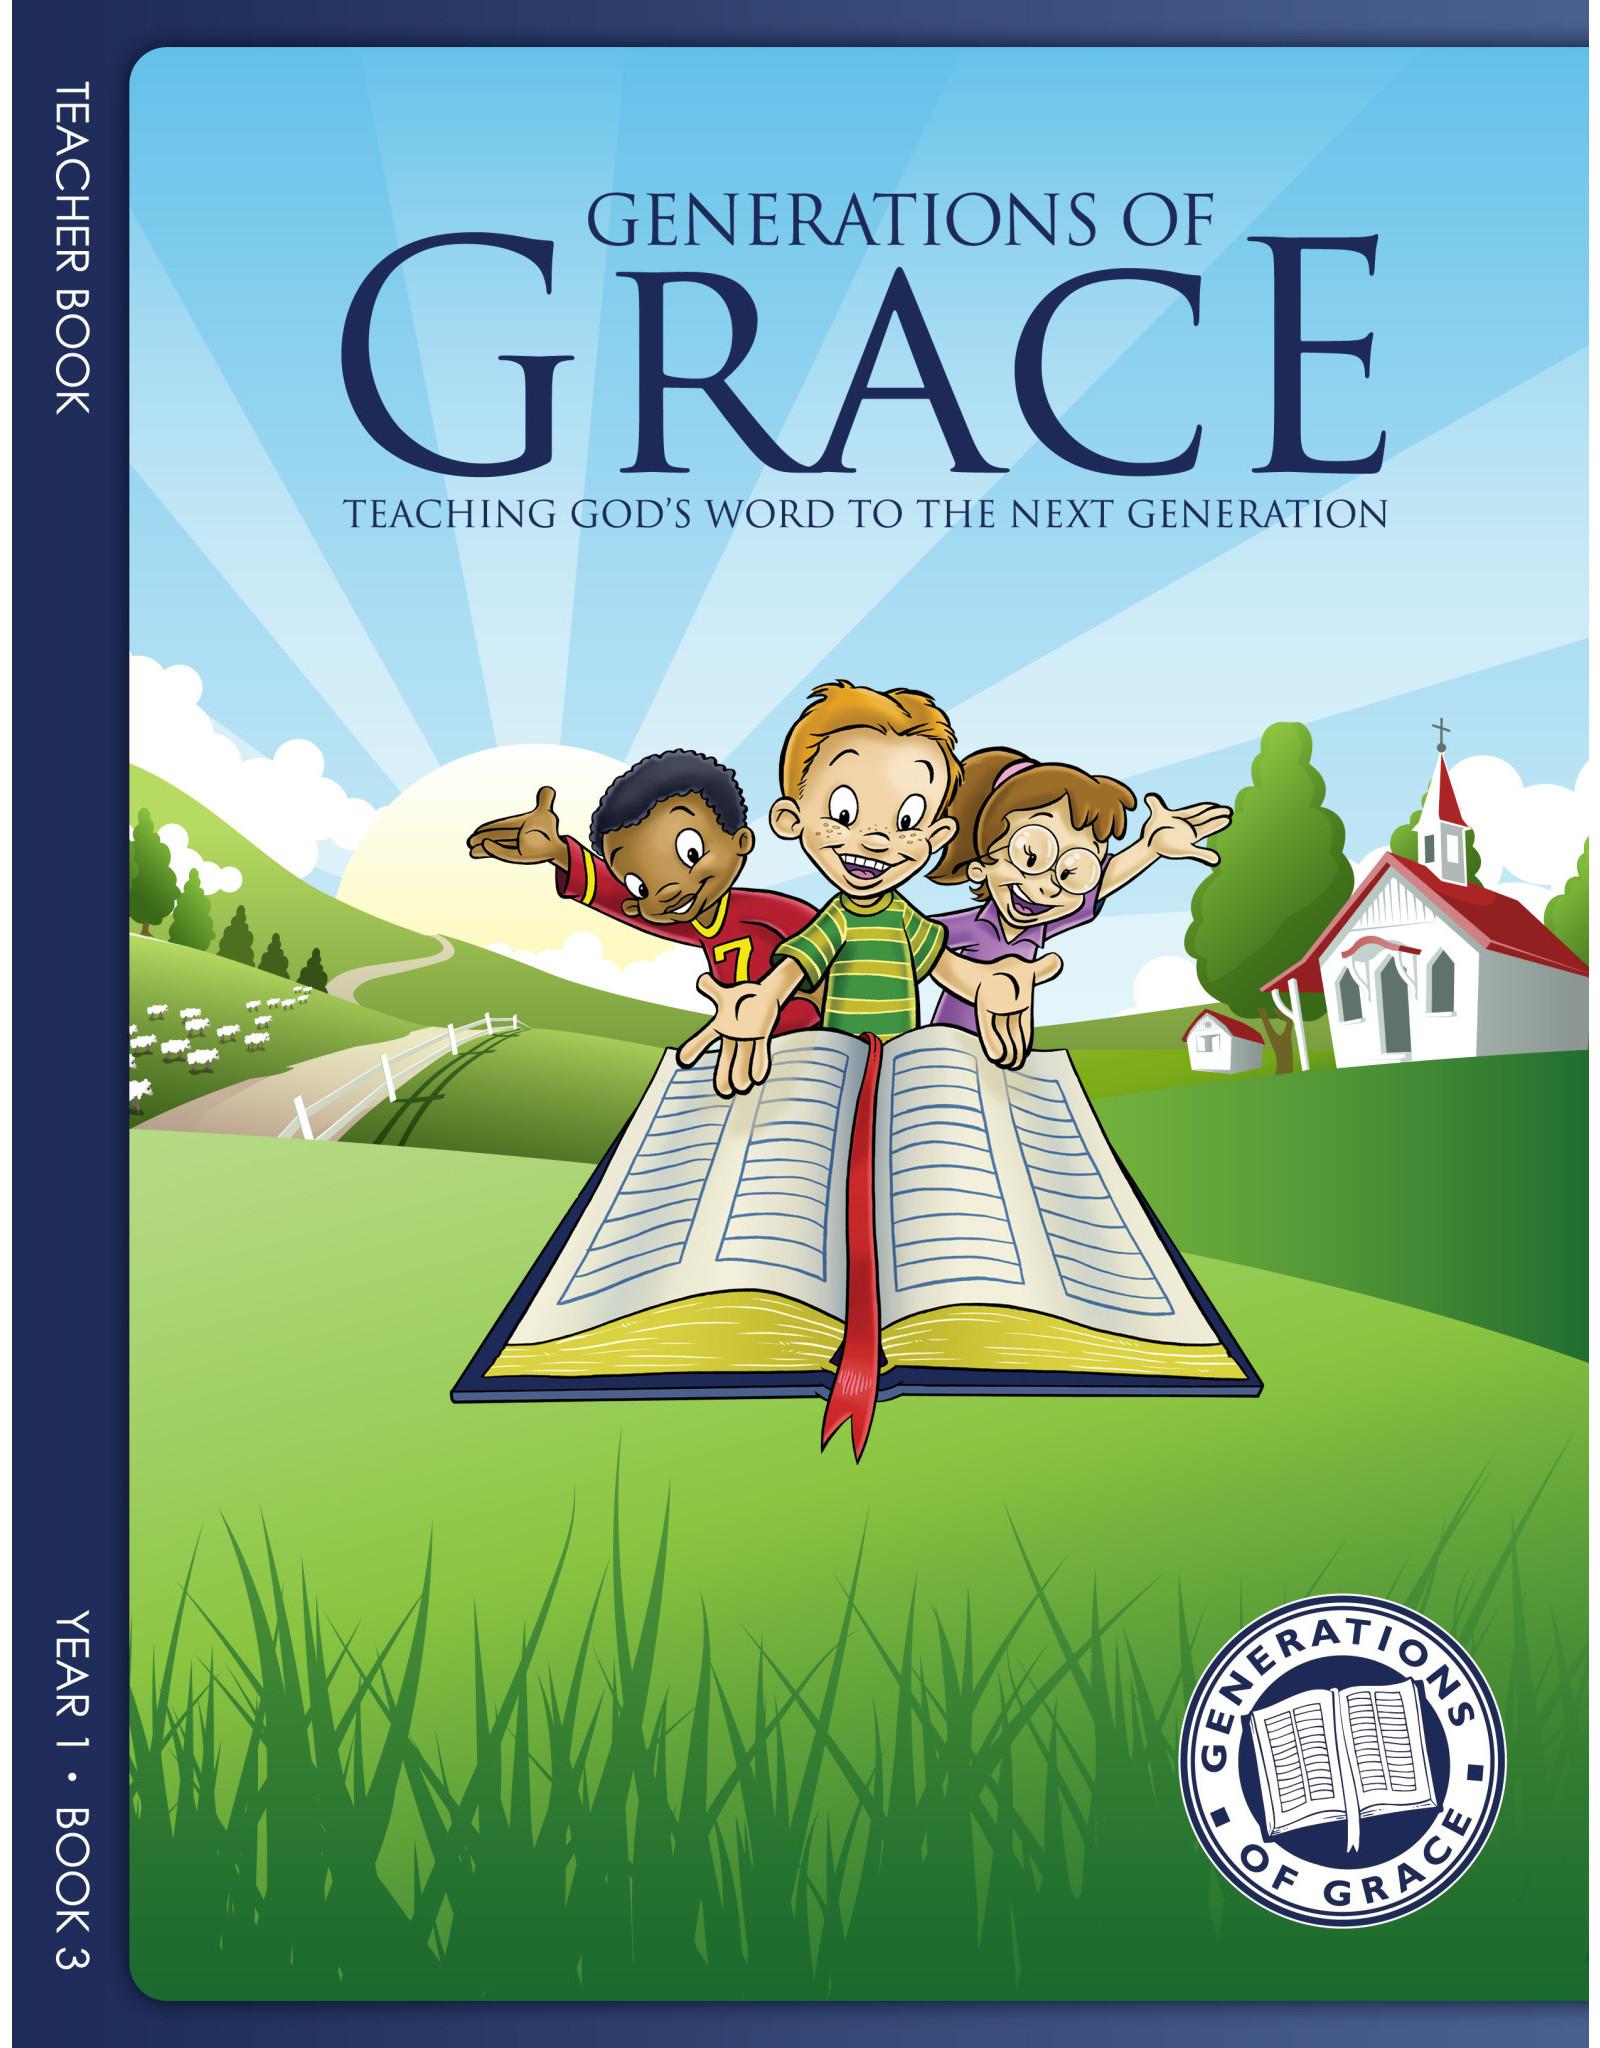 Grace Community Church (GCC) Generations of Grace (GOG) - Teacher Book - Year 2 Book 3